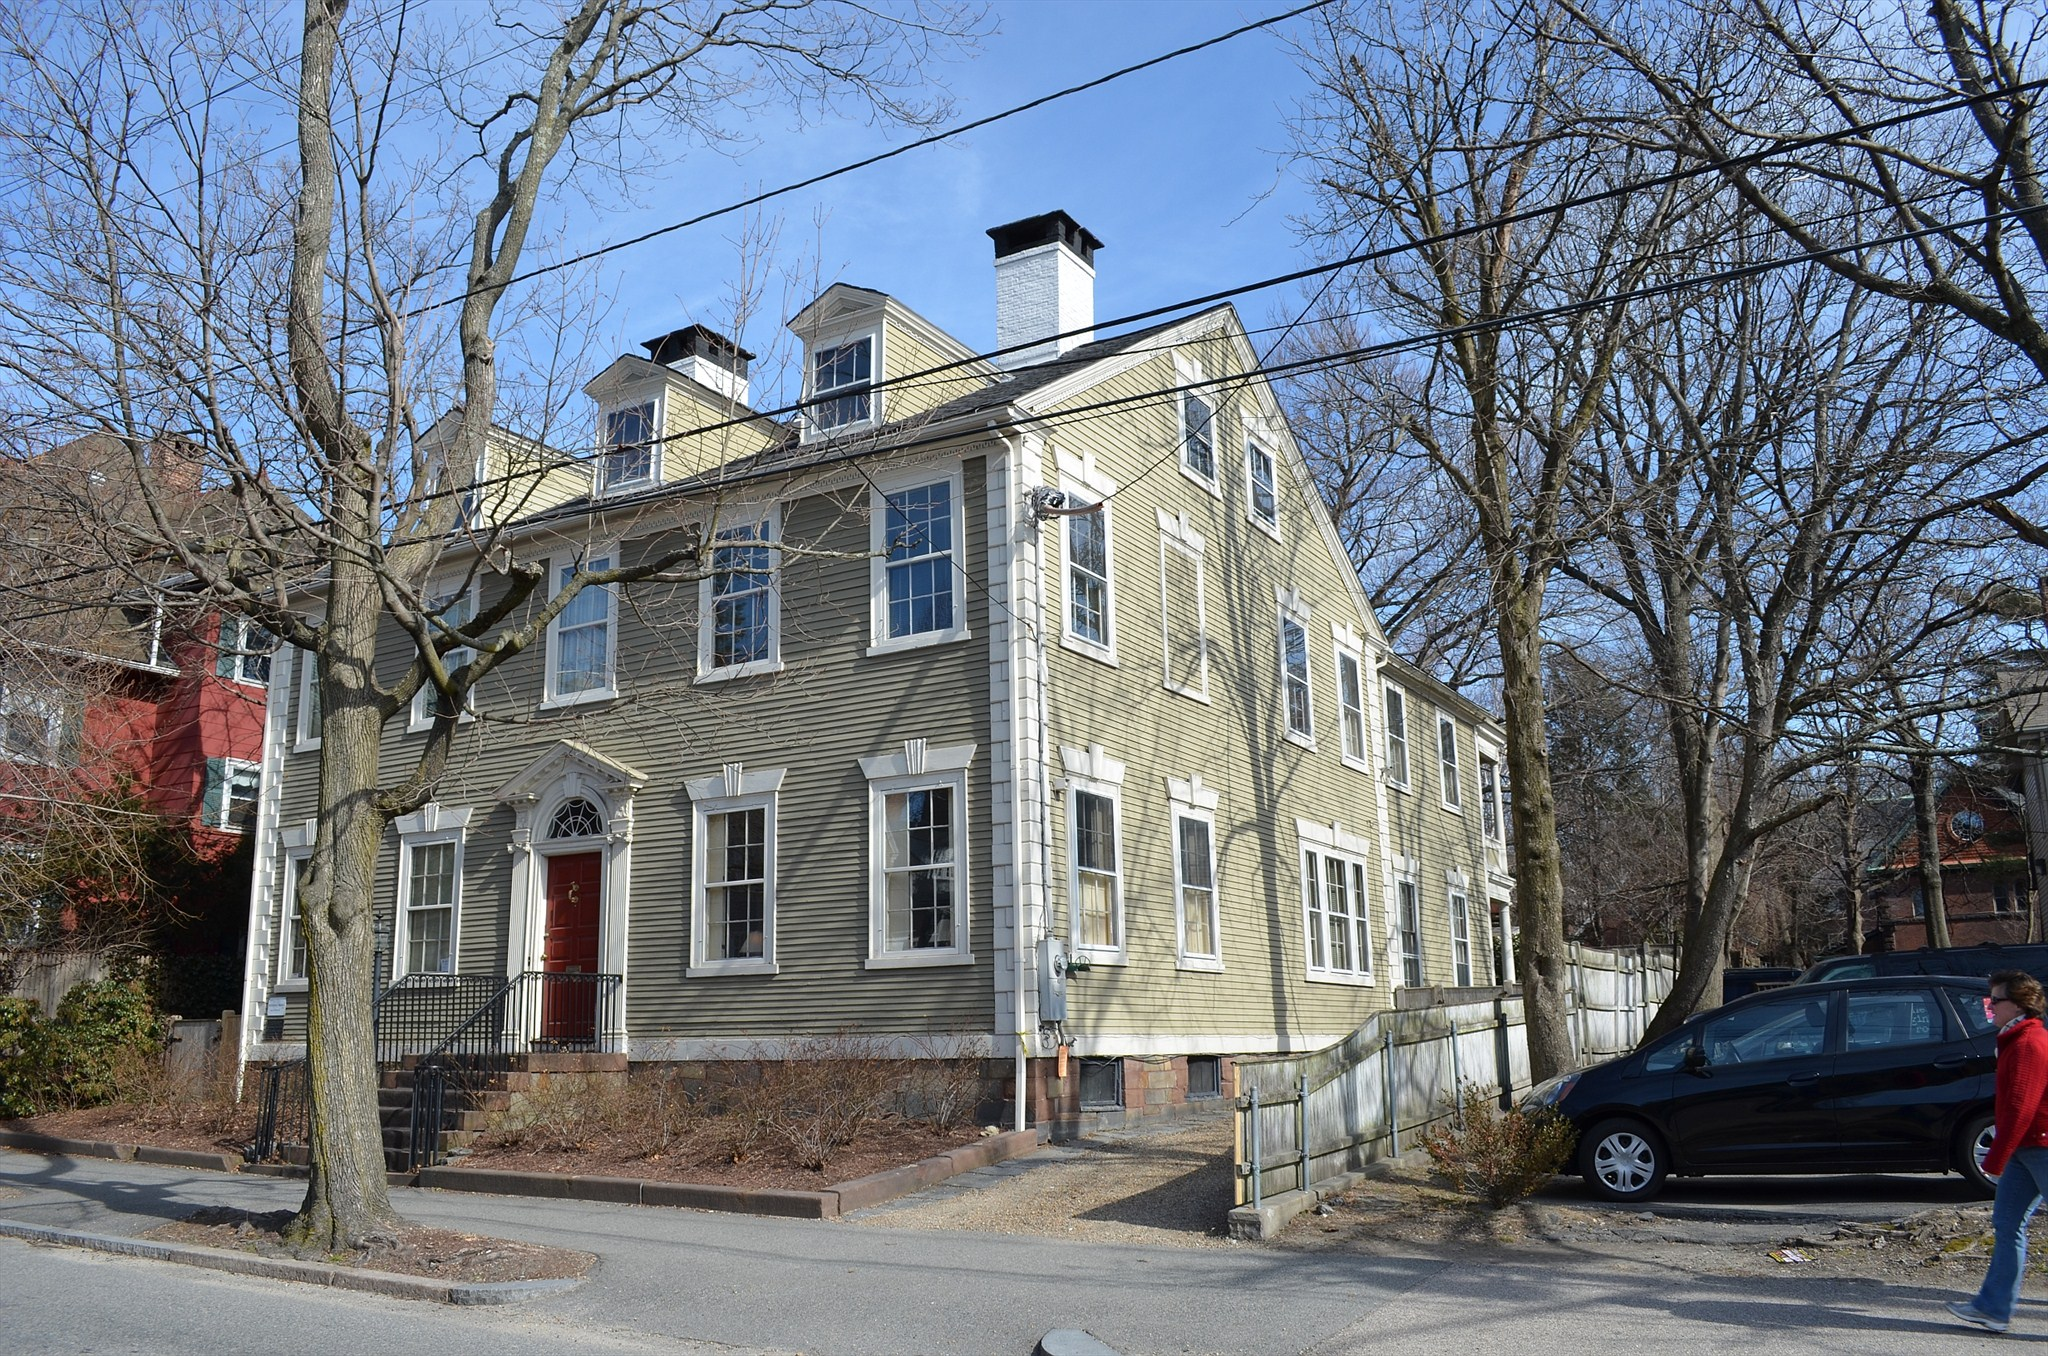 Pearce, Nathaniel, House - Providence RI Image